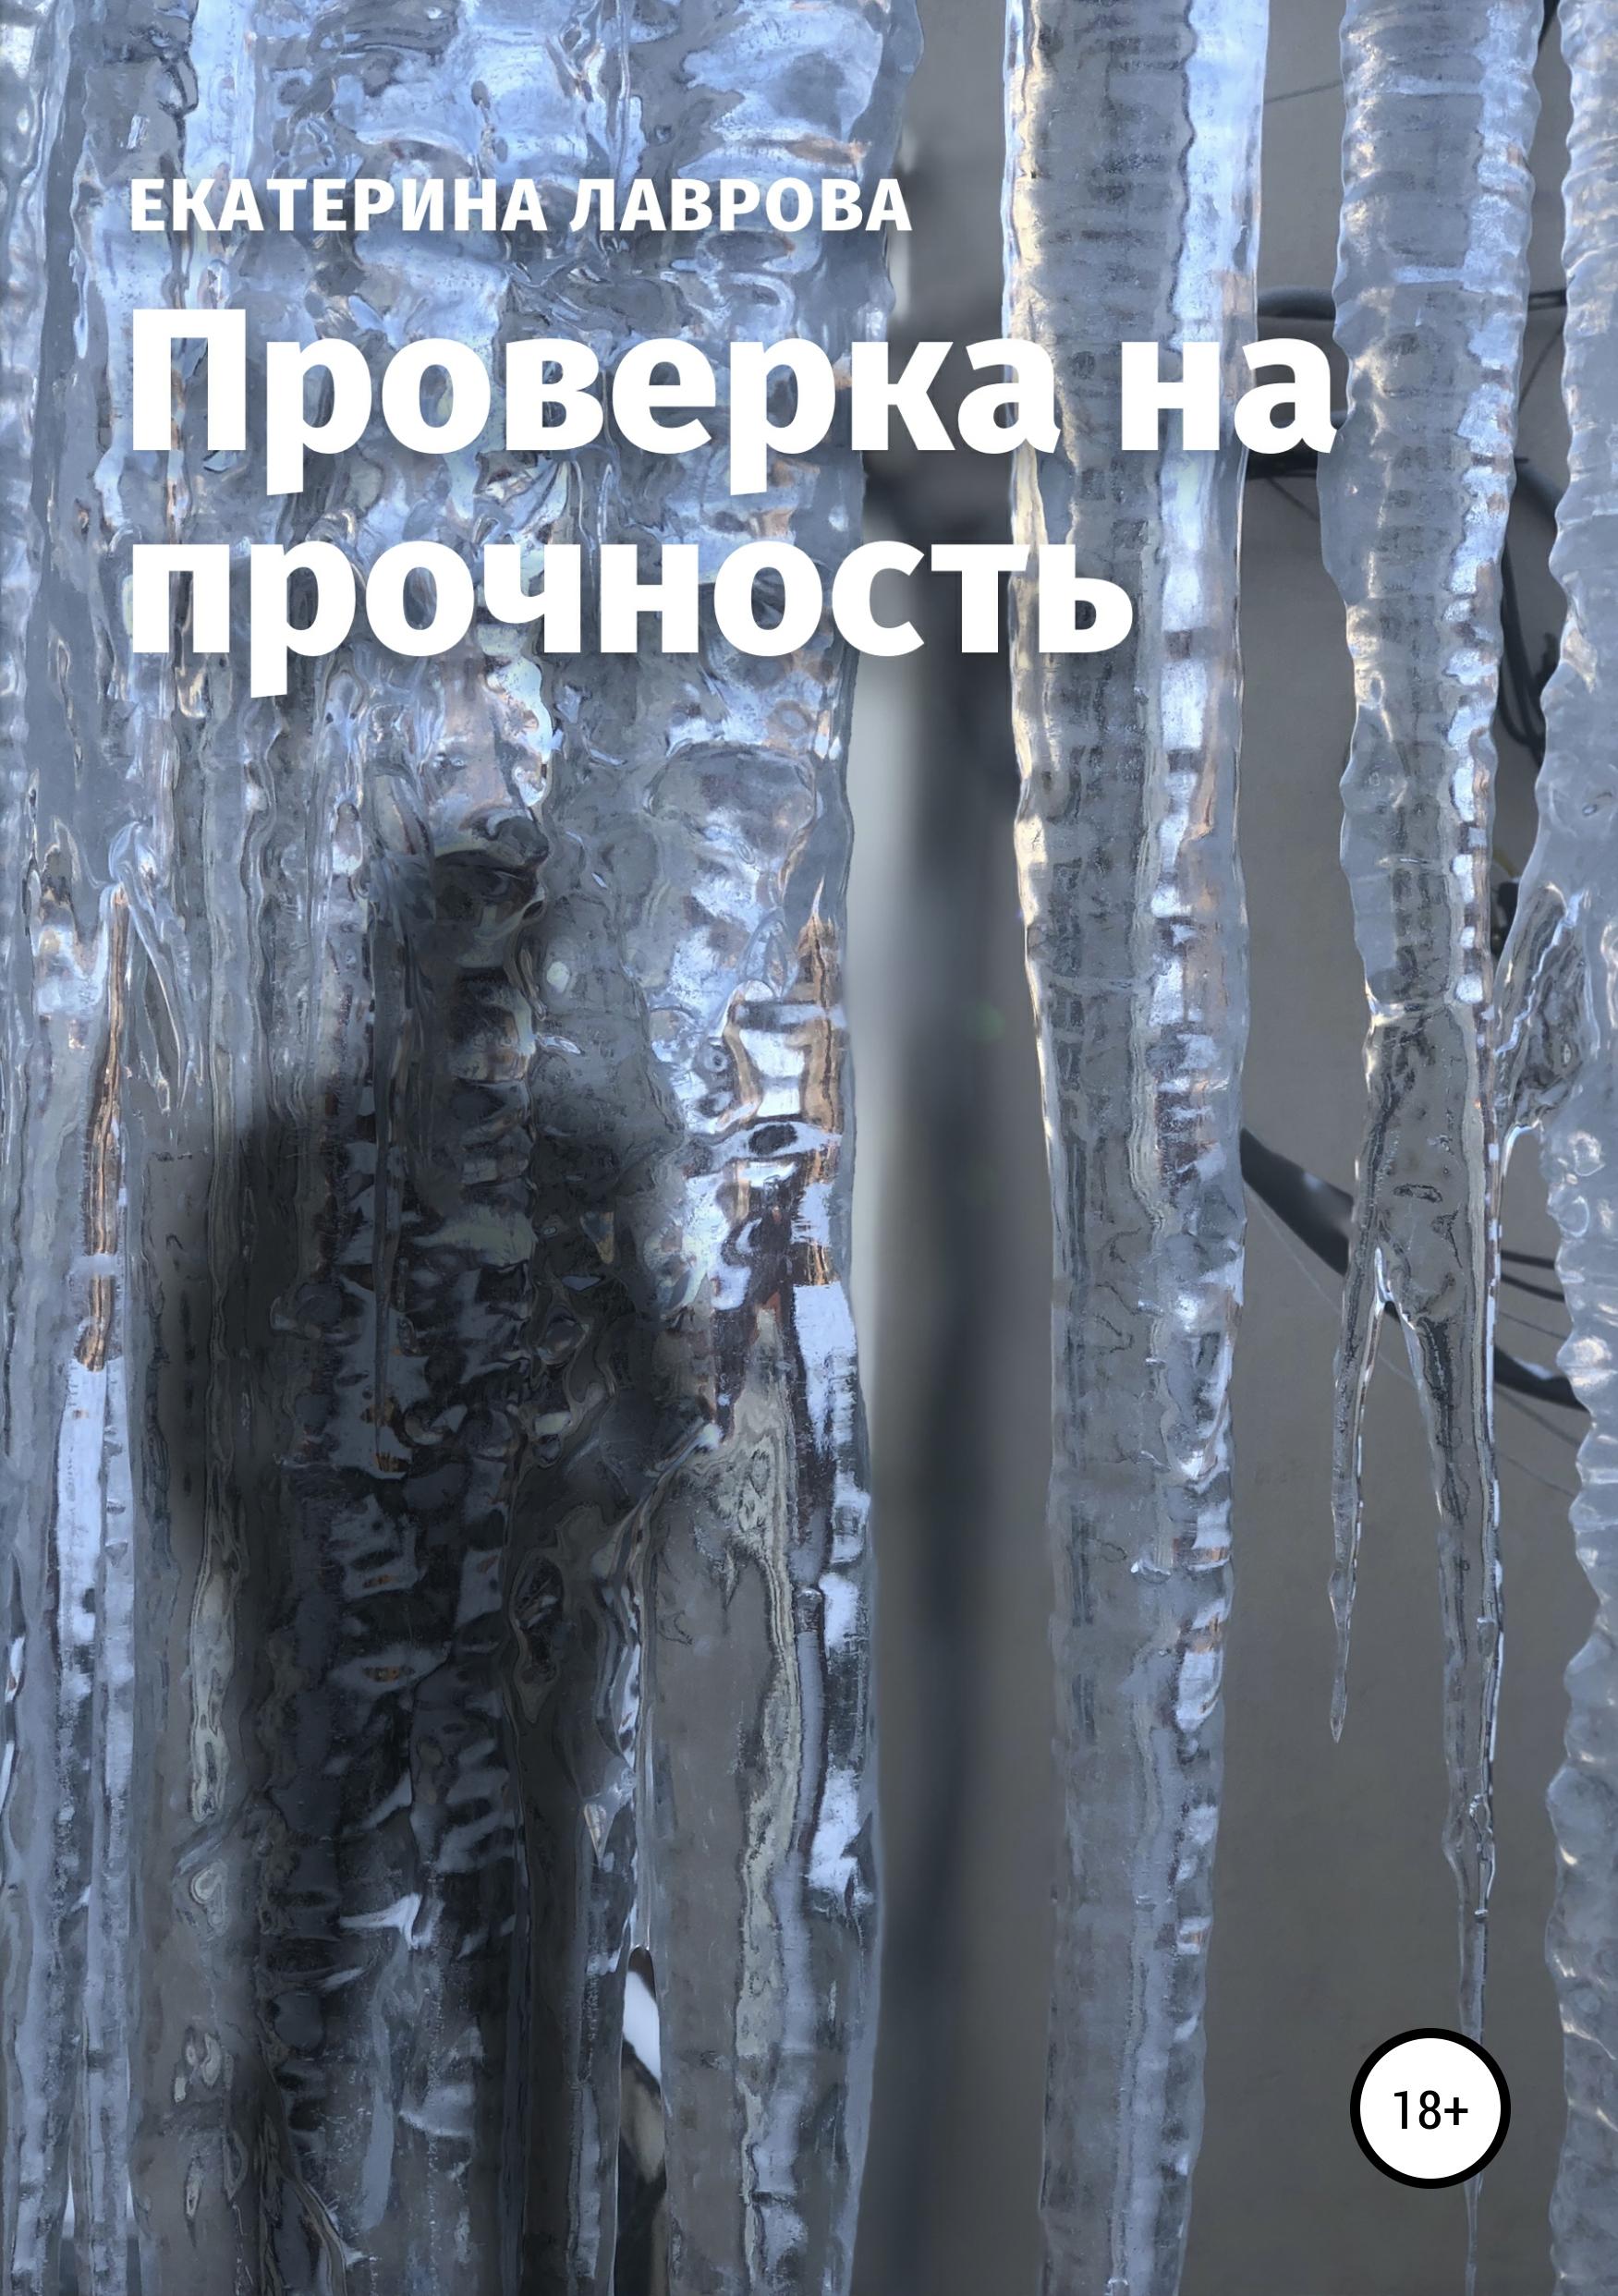 Обложка книги. Автор - Екатерина Лаврова